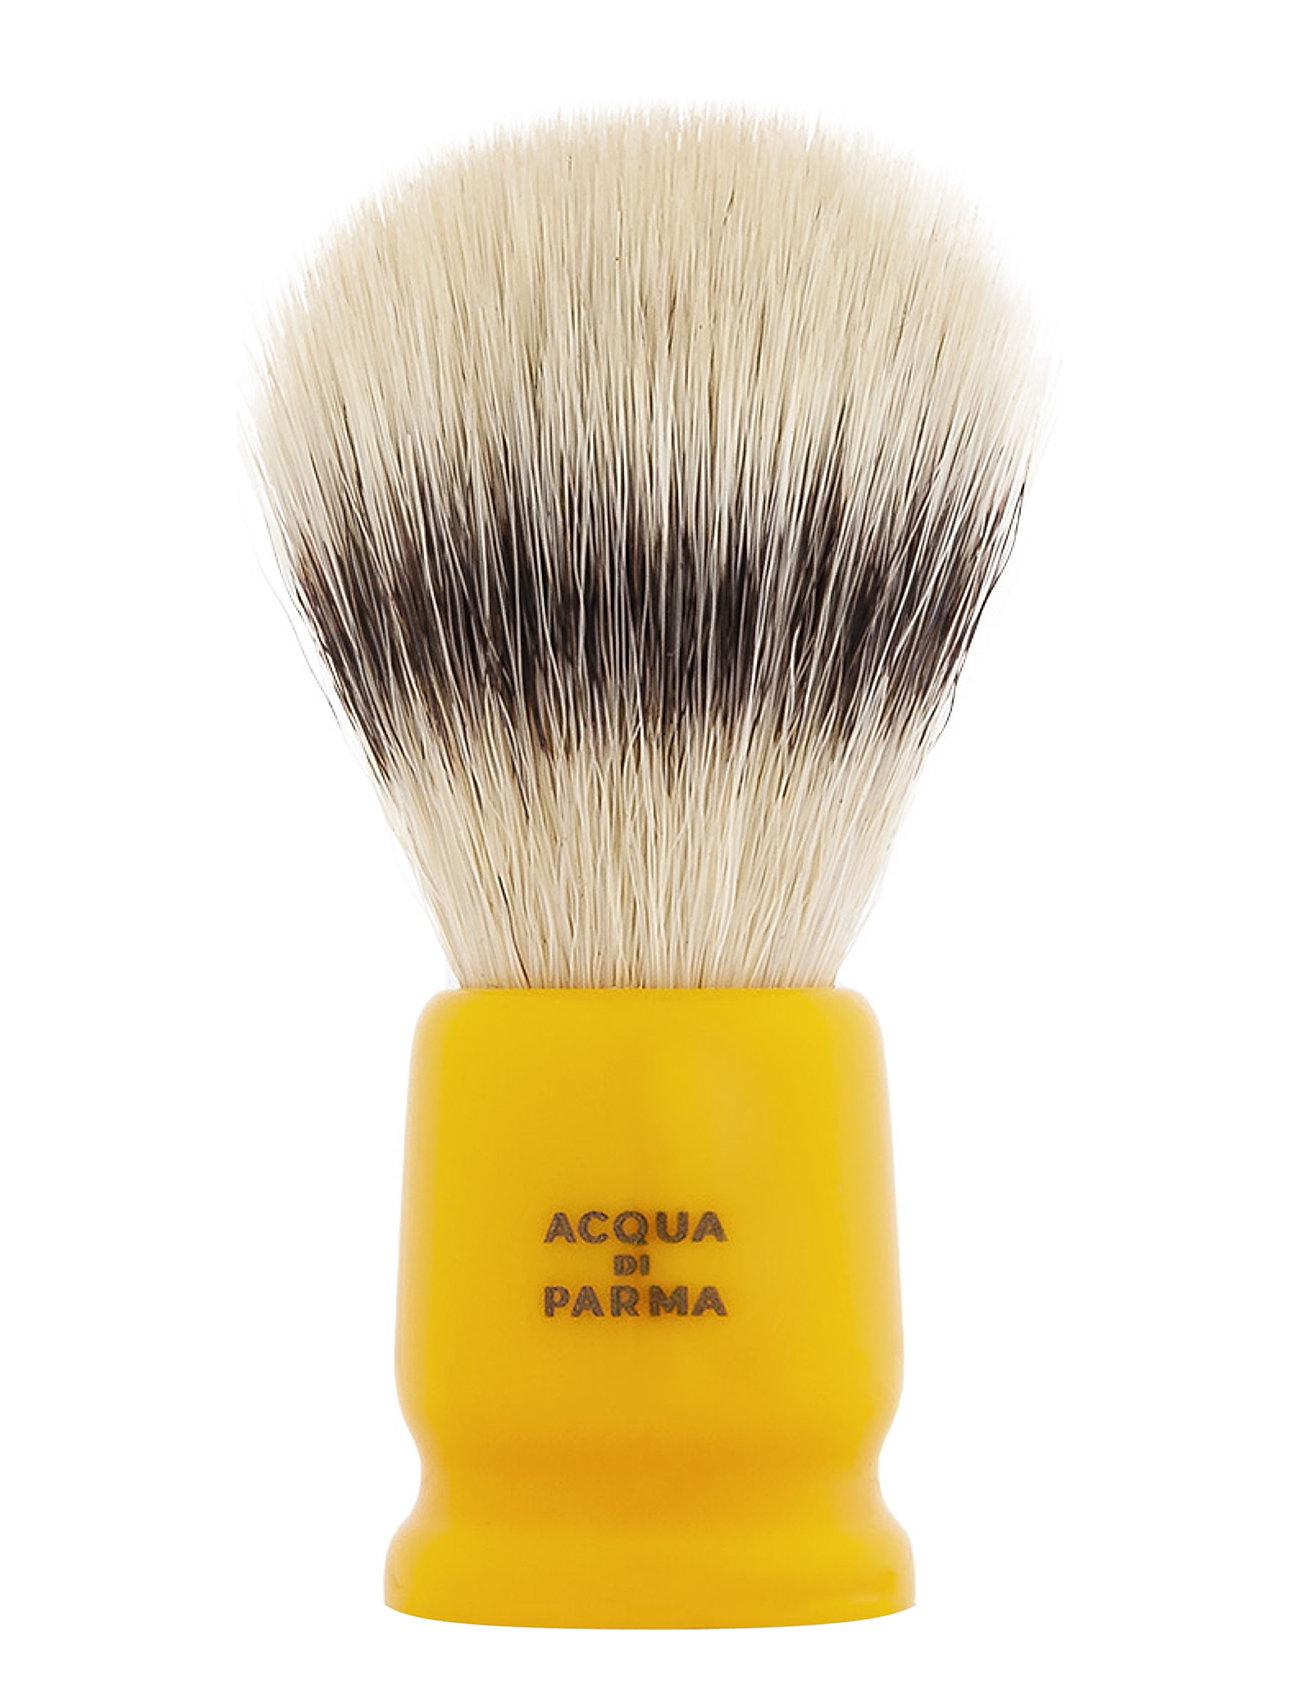 Acqua di Parma Yellow Travel Shaving Brush - CLEAR